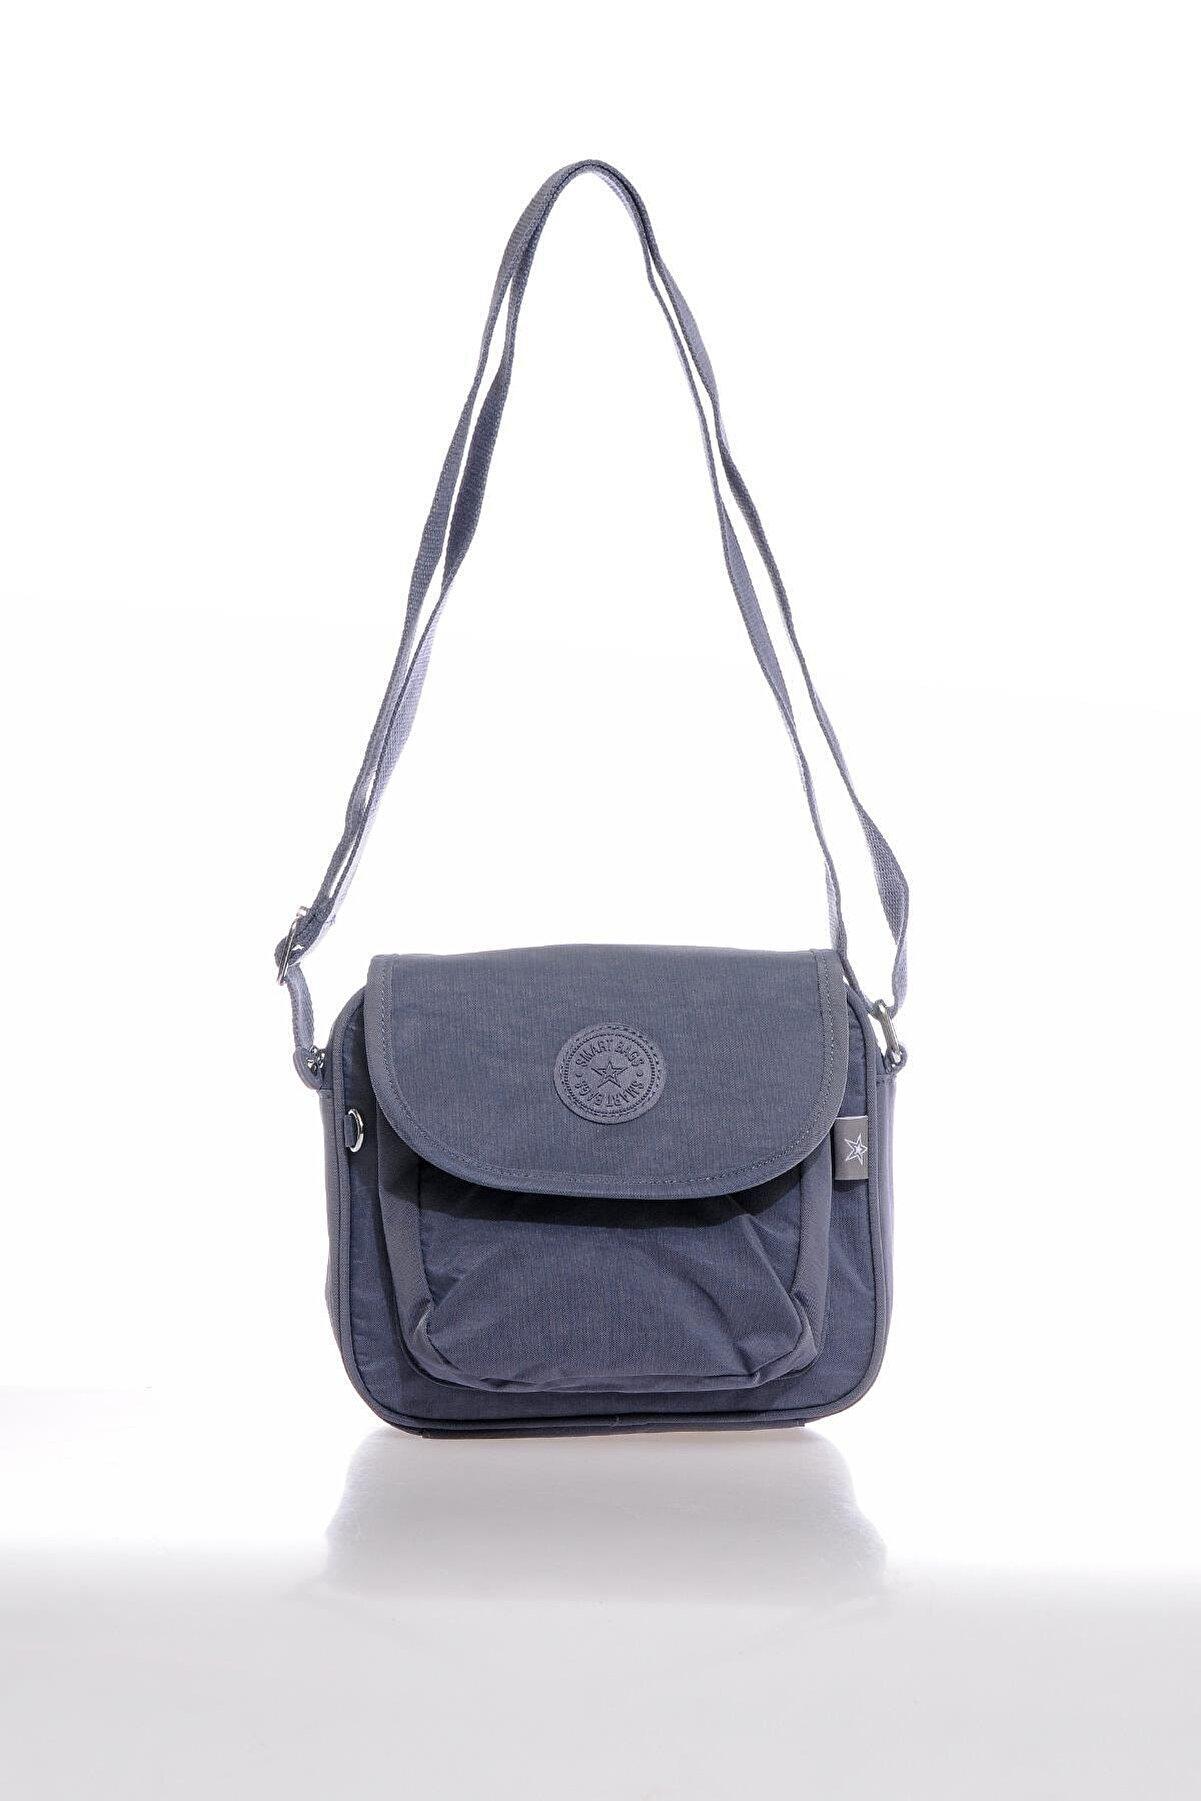 Smart Bags Smb3057-0089 Füme Kadın Çapraz Çanta